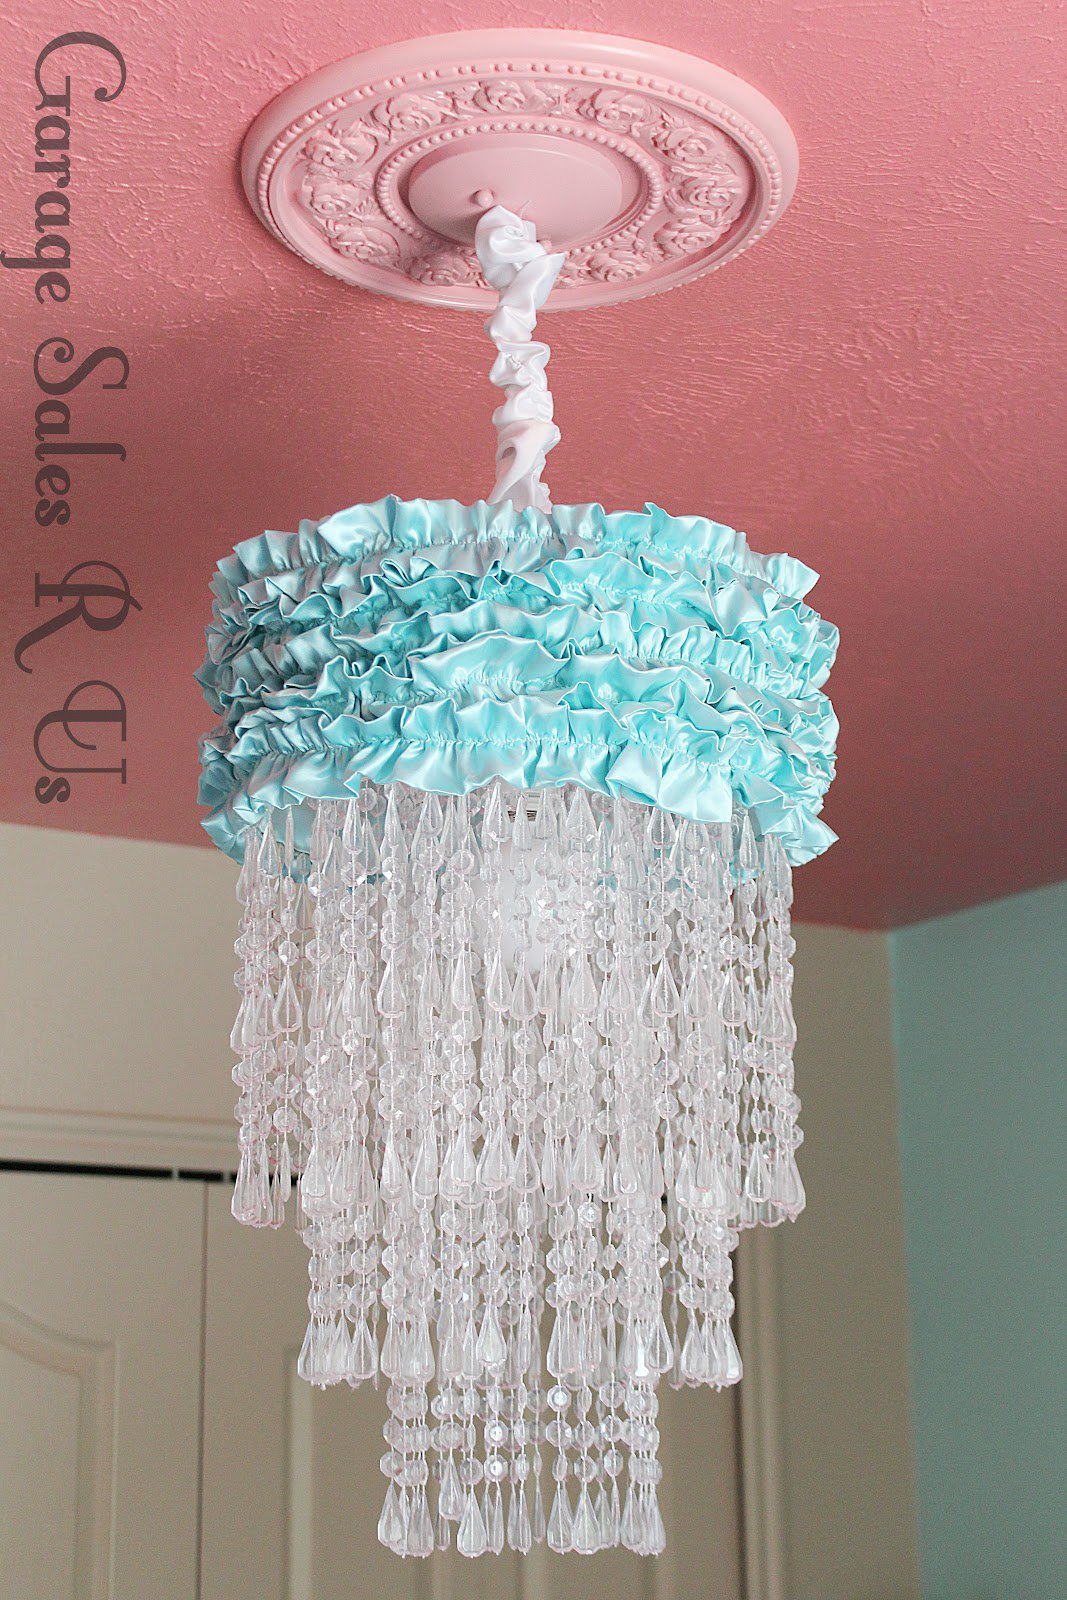 diy chandelier 5 SMPPYAP